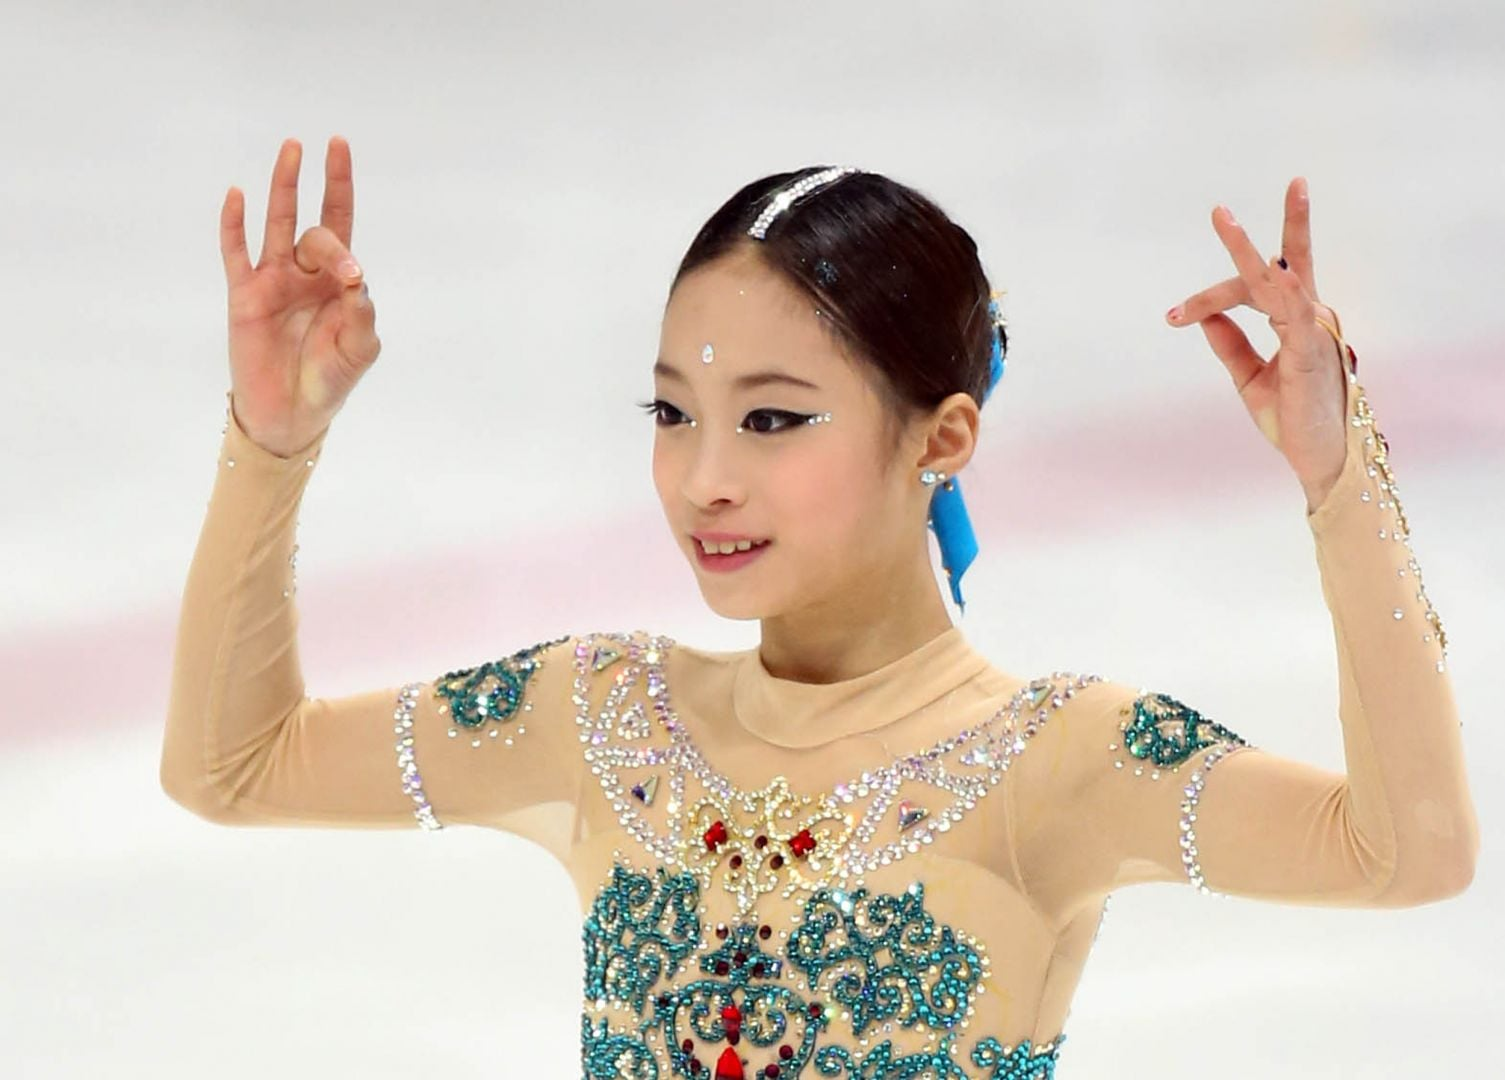 You Young at the Korean Figure Skating Championships.